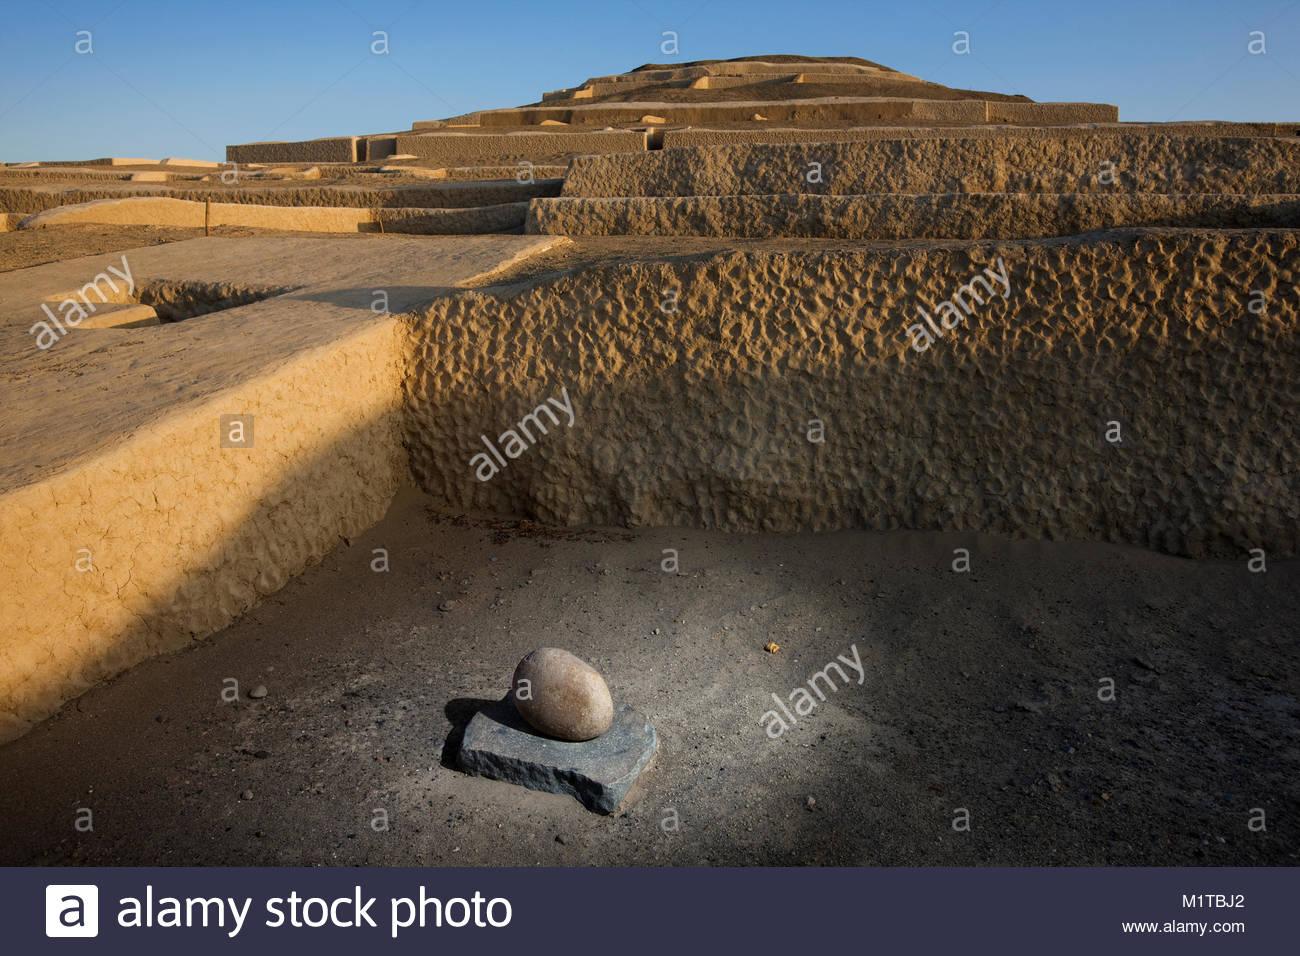 Cahuachi, Peru. - Stock Image